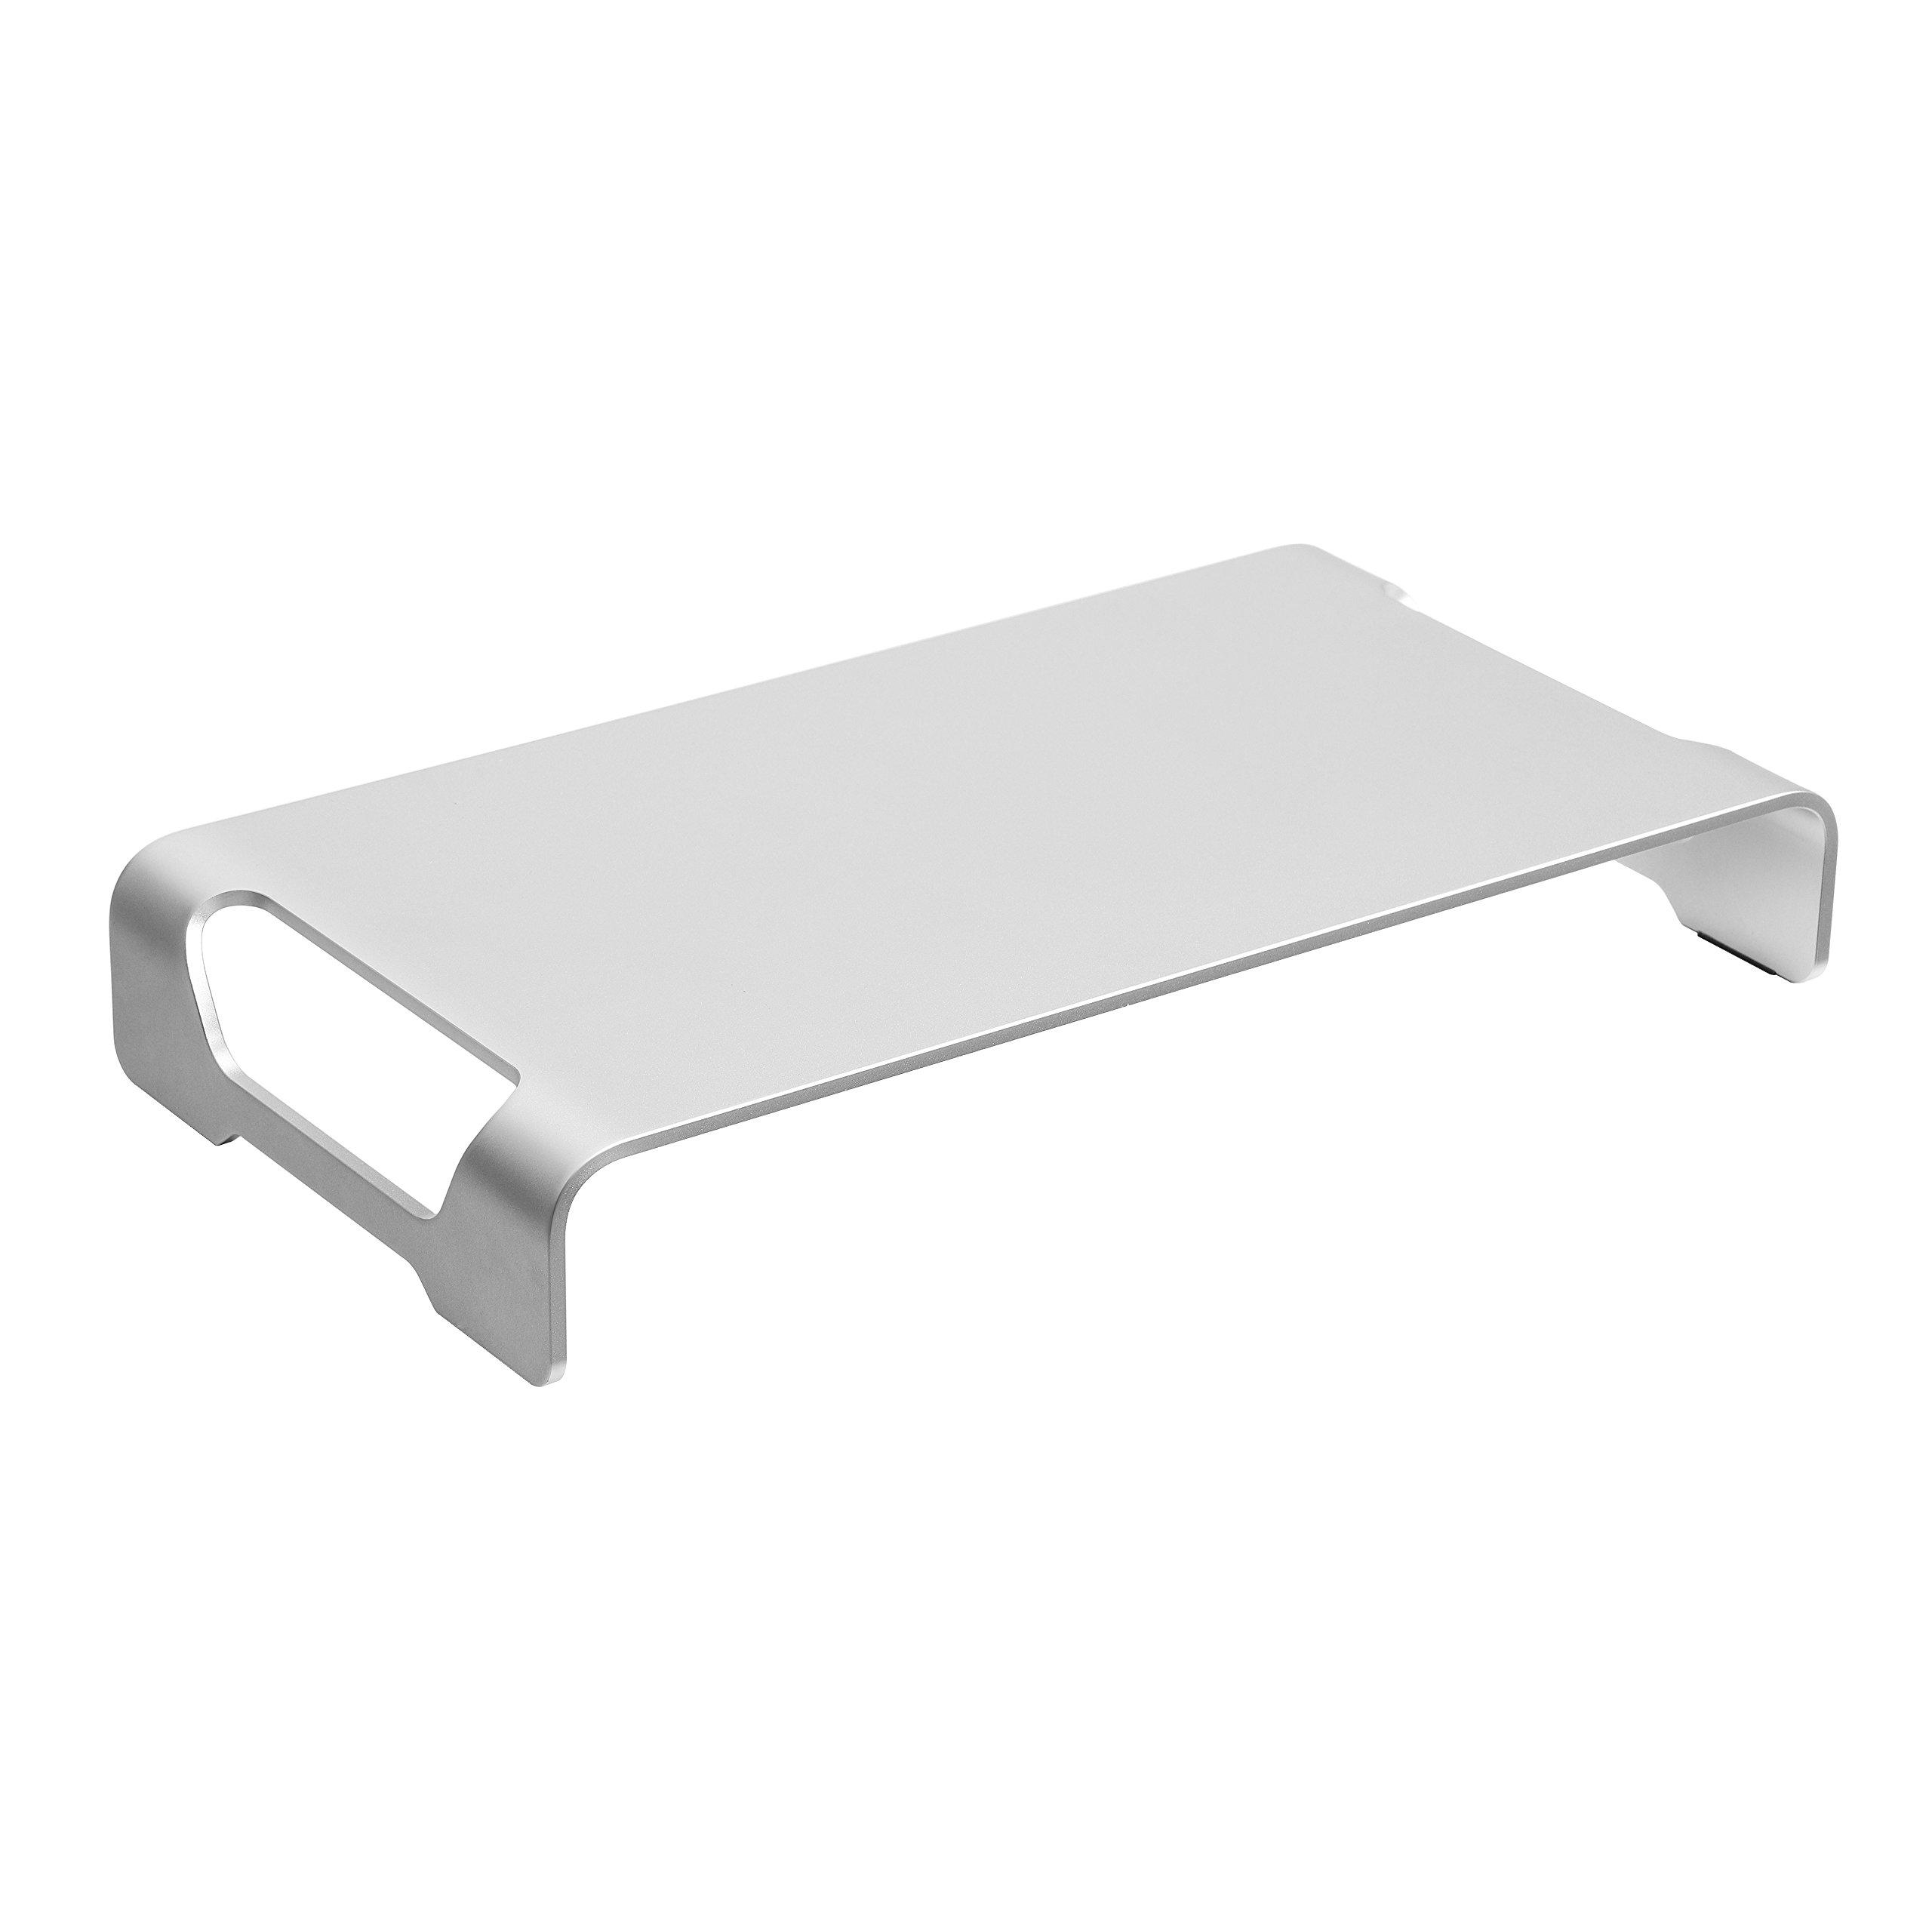 SONGMICS Aluminum Monitor Stand Riser, Ergonomic, Multifunctional Desktop Storage Organizer for Computer, Laptop, Printer and Office Supply UOMS04SV